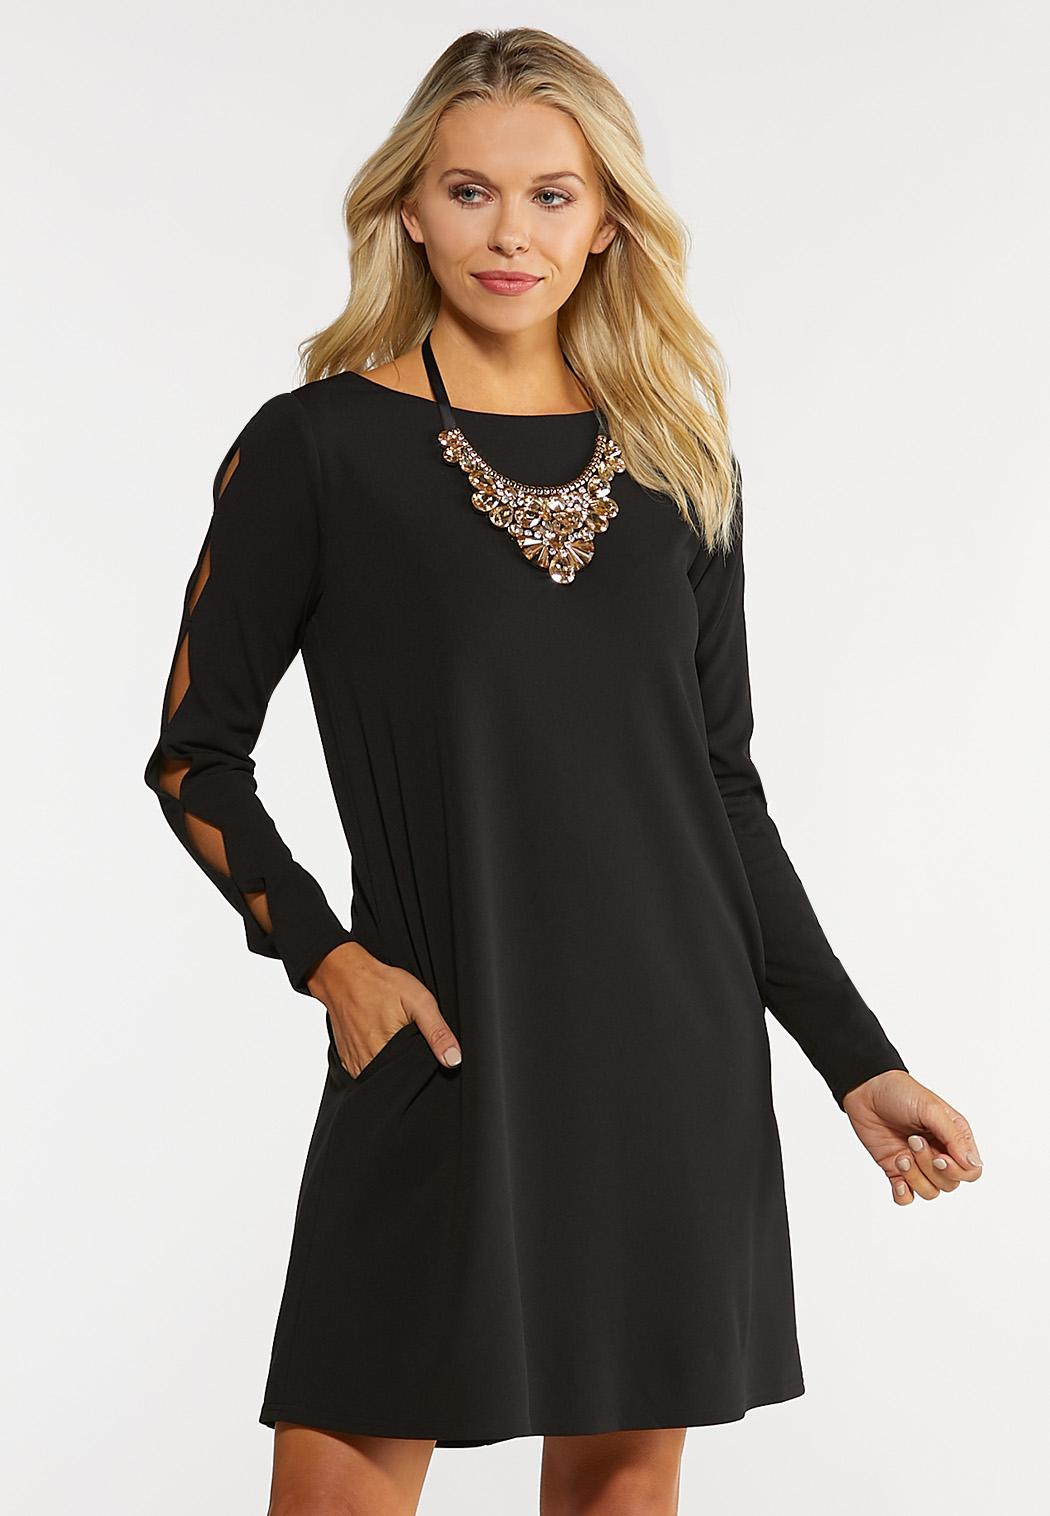 Plus Size Cutout Sleeve Swing Dress A- Line & Amp ; Swing Cato Fashions